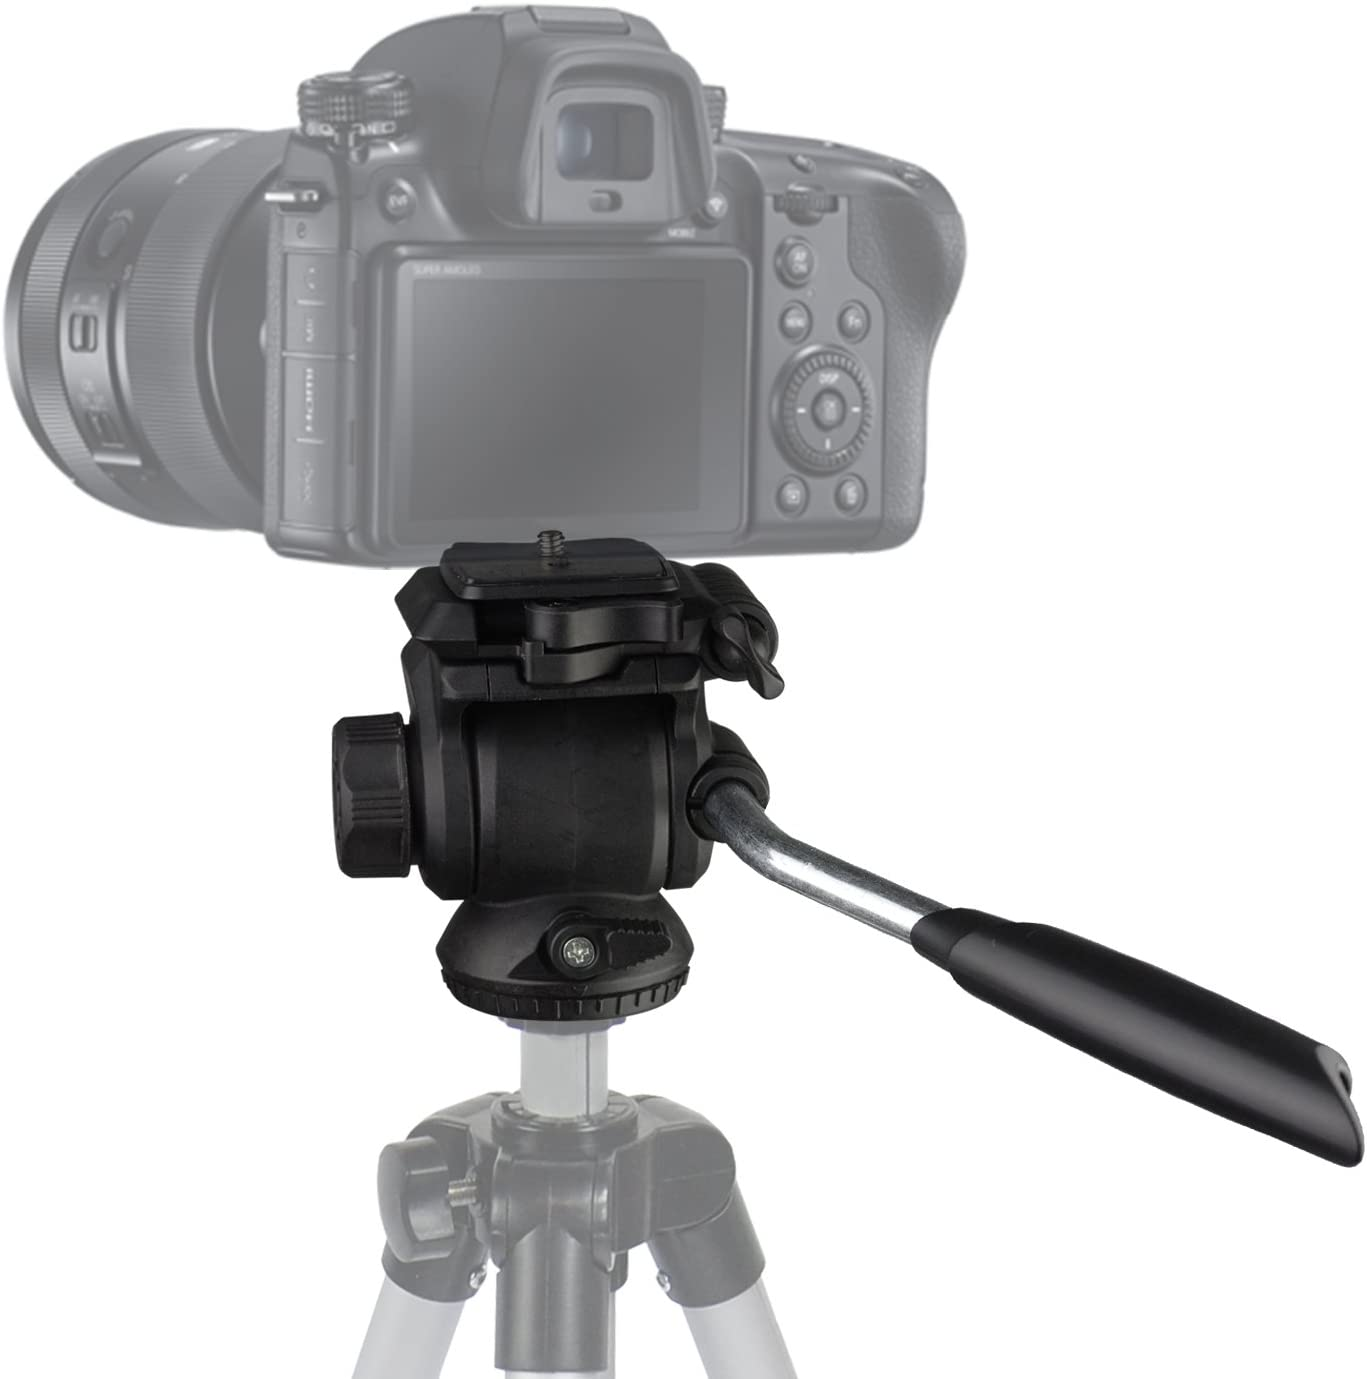 Flexible Angle Adjustable Comfortable Handle Bar Camera Holding Plate Photo Studio LS Photography DSLR Camera and Tripod Stand Adapter LGG620